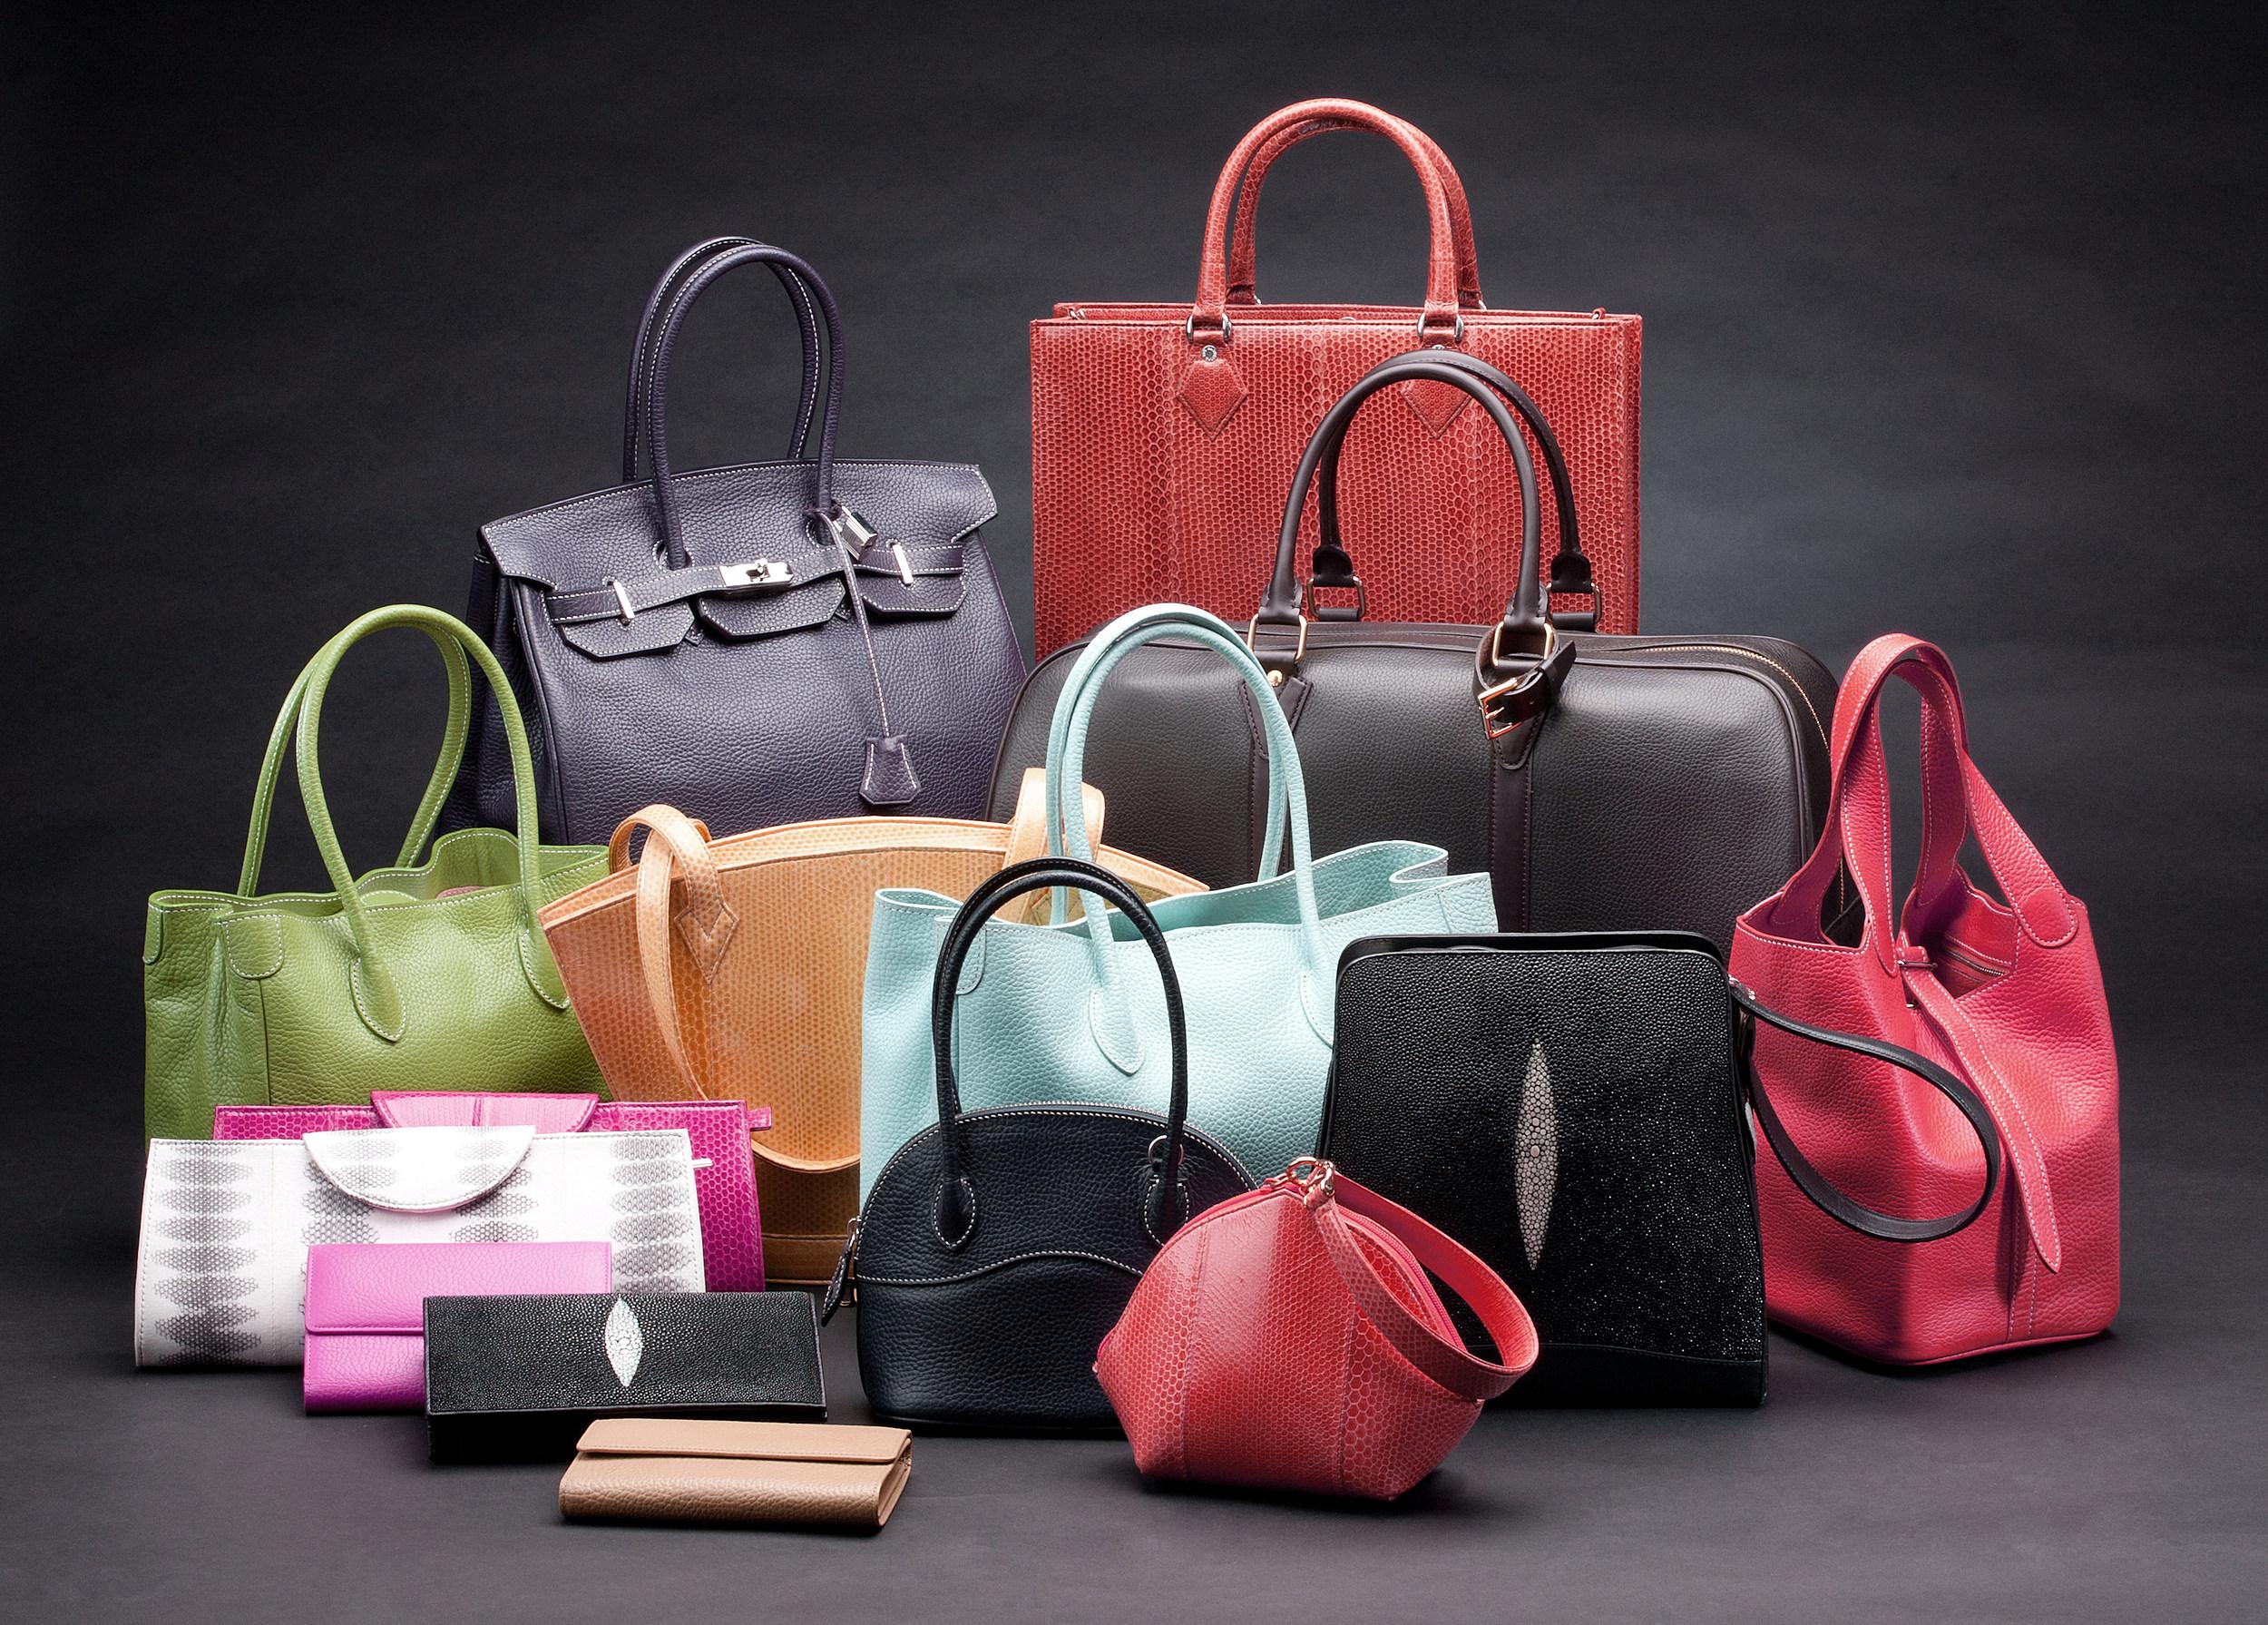 Set of beautiful leather handbags